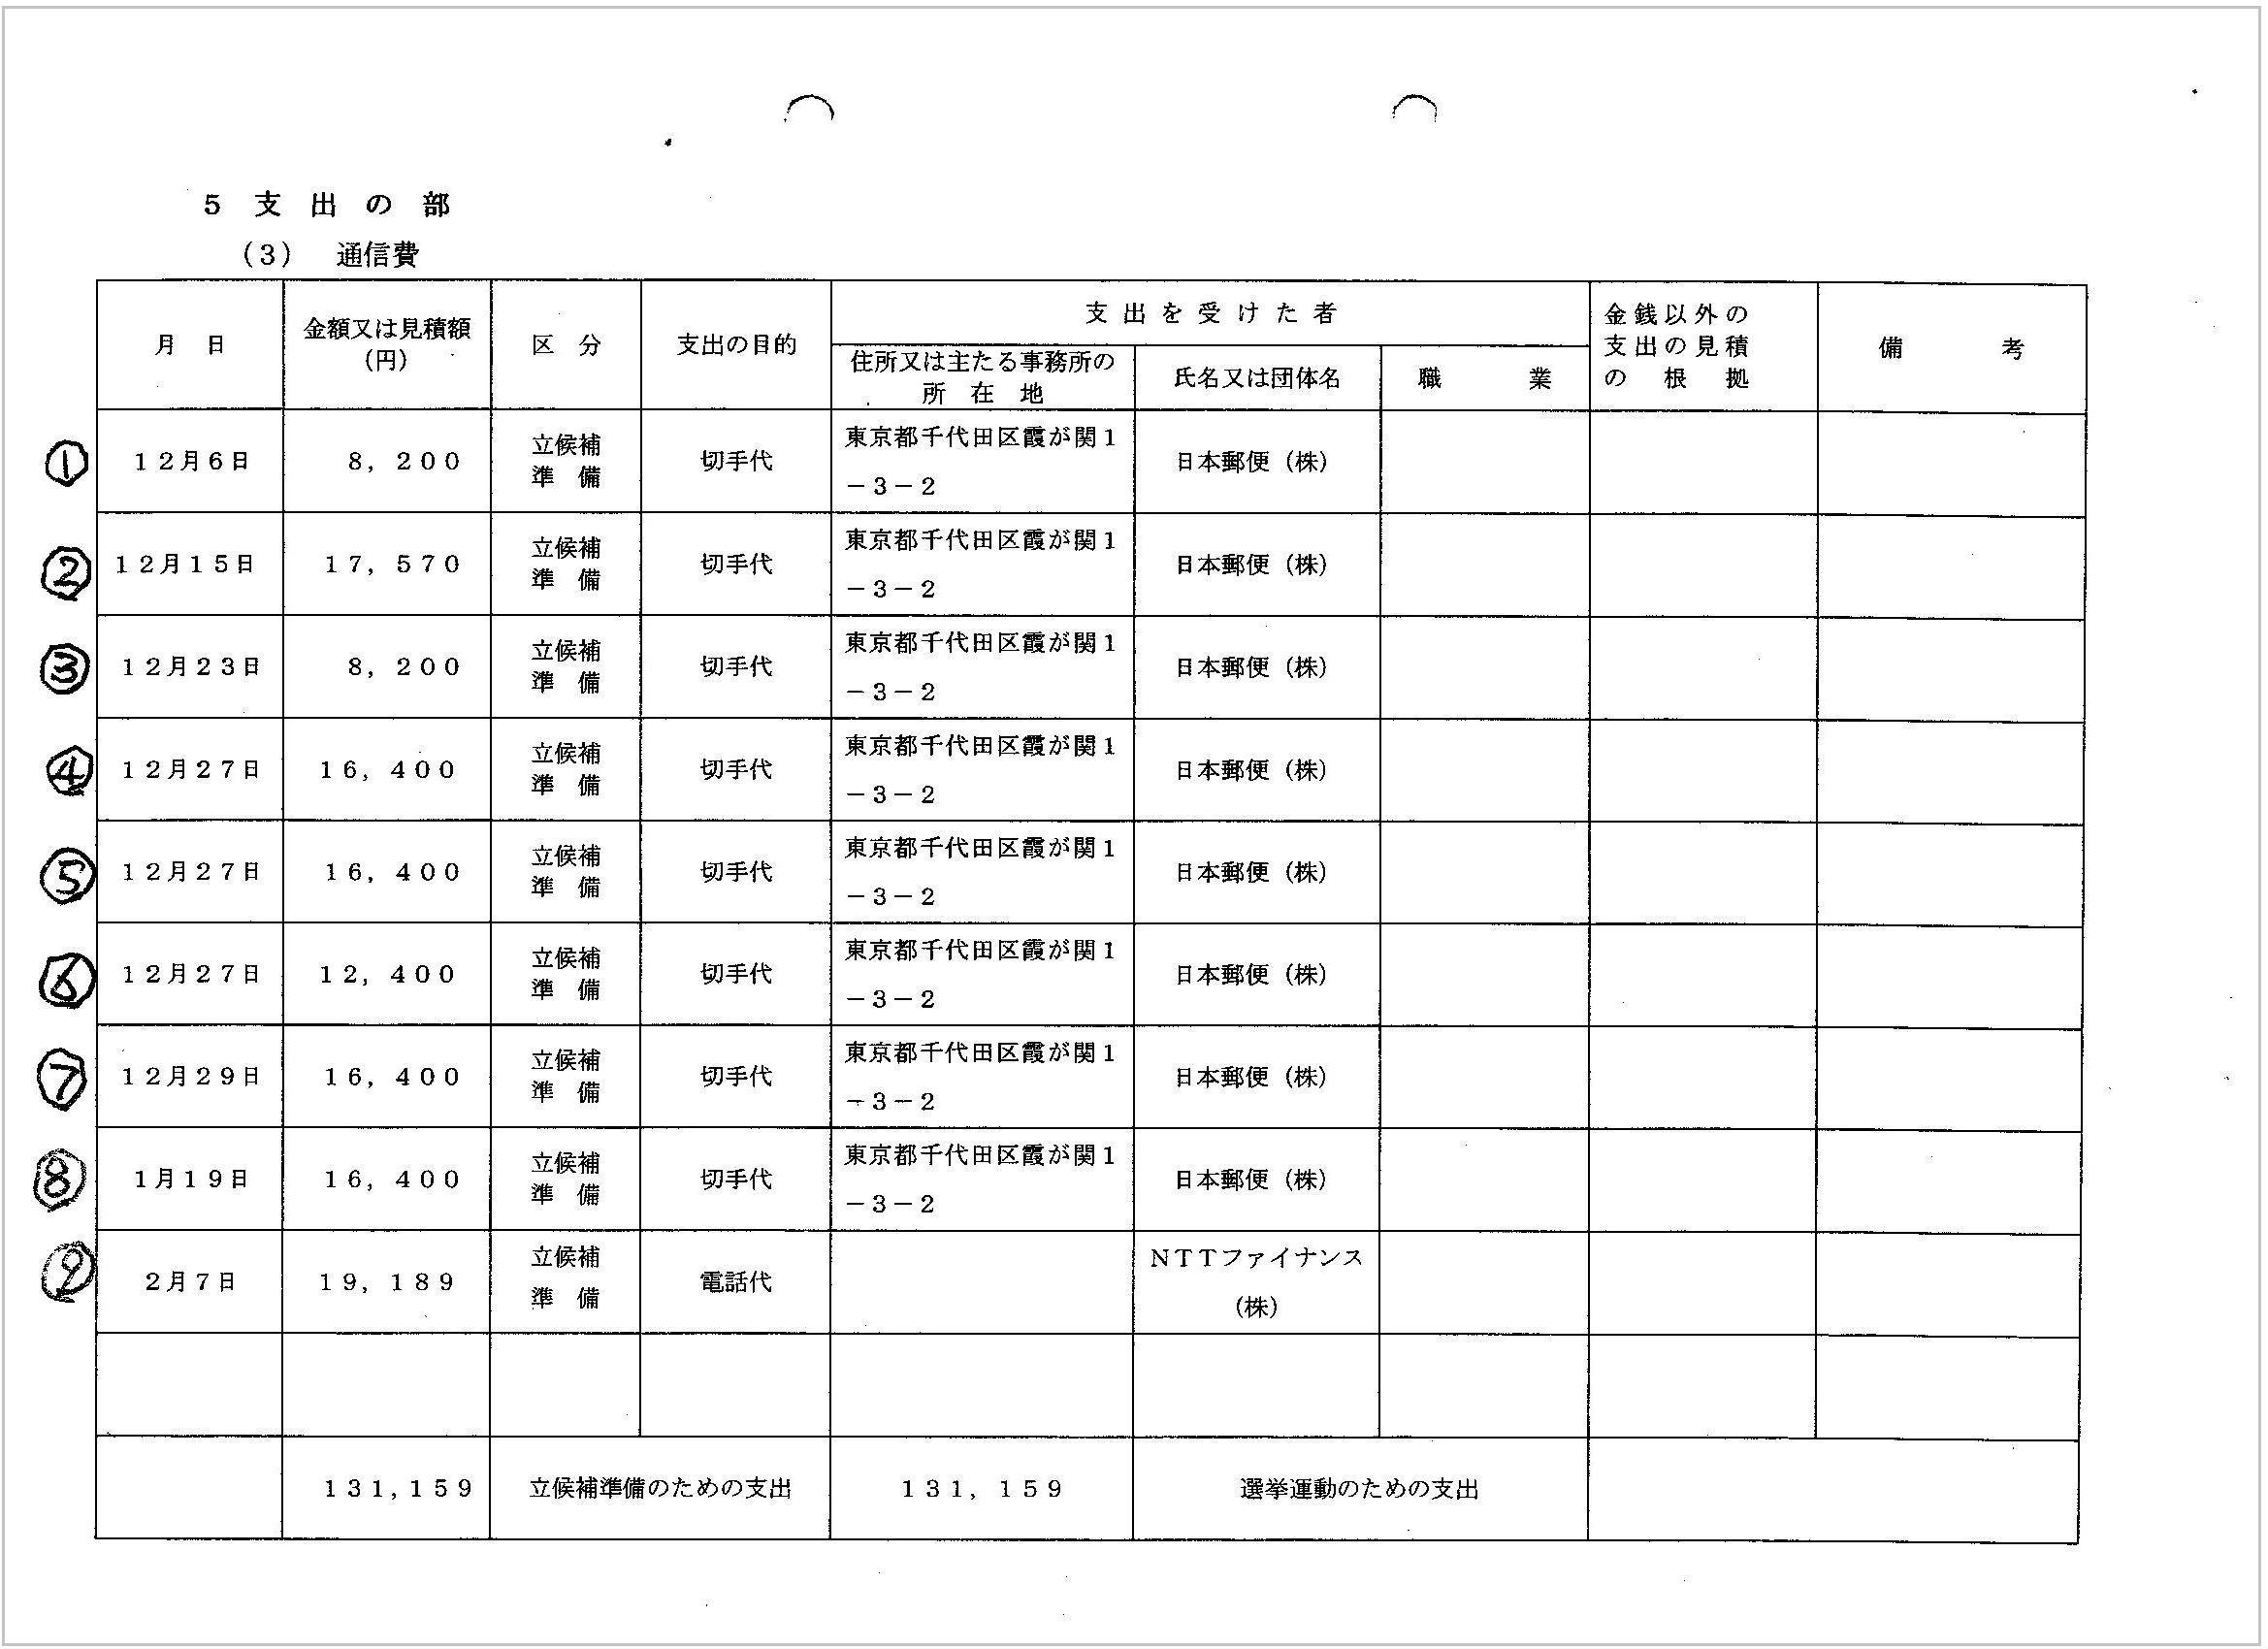 http://hunter-investigate.jp/news/223b6eeb86d633c5c1dd113b0eb6163eb28c058e.jpg